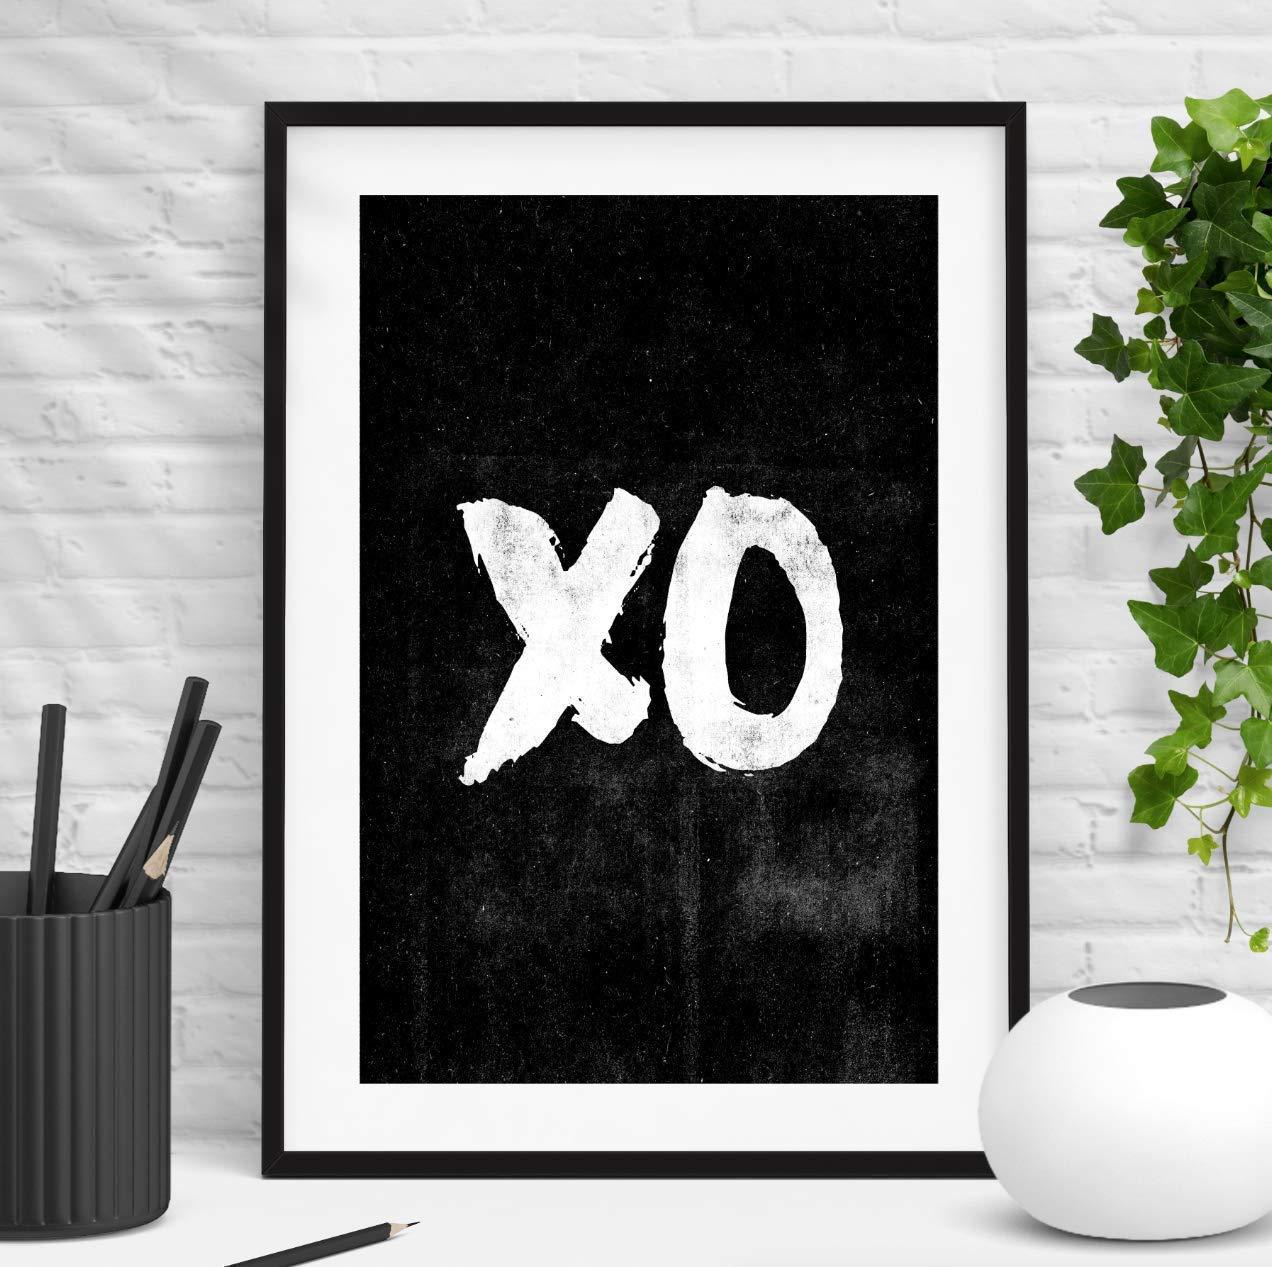 XO Hugs and Kisses XOXO Inspirational Wall Art Print Home Decor Typography Poster Black and White Bedroom Decor